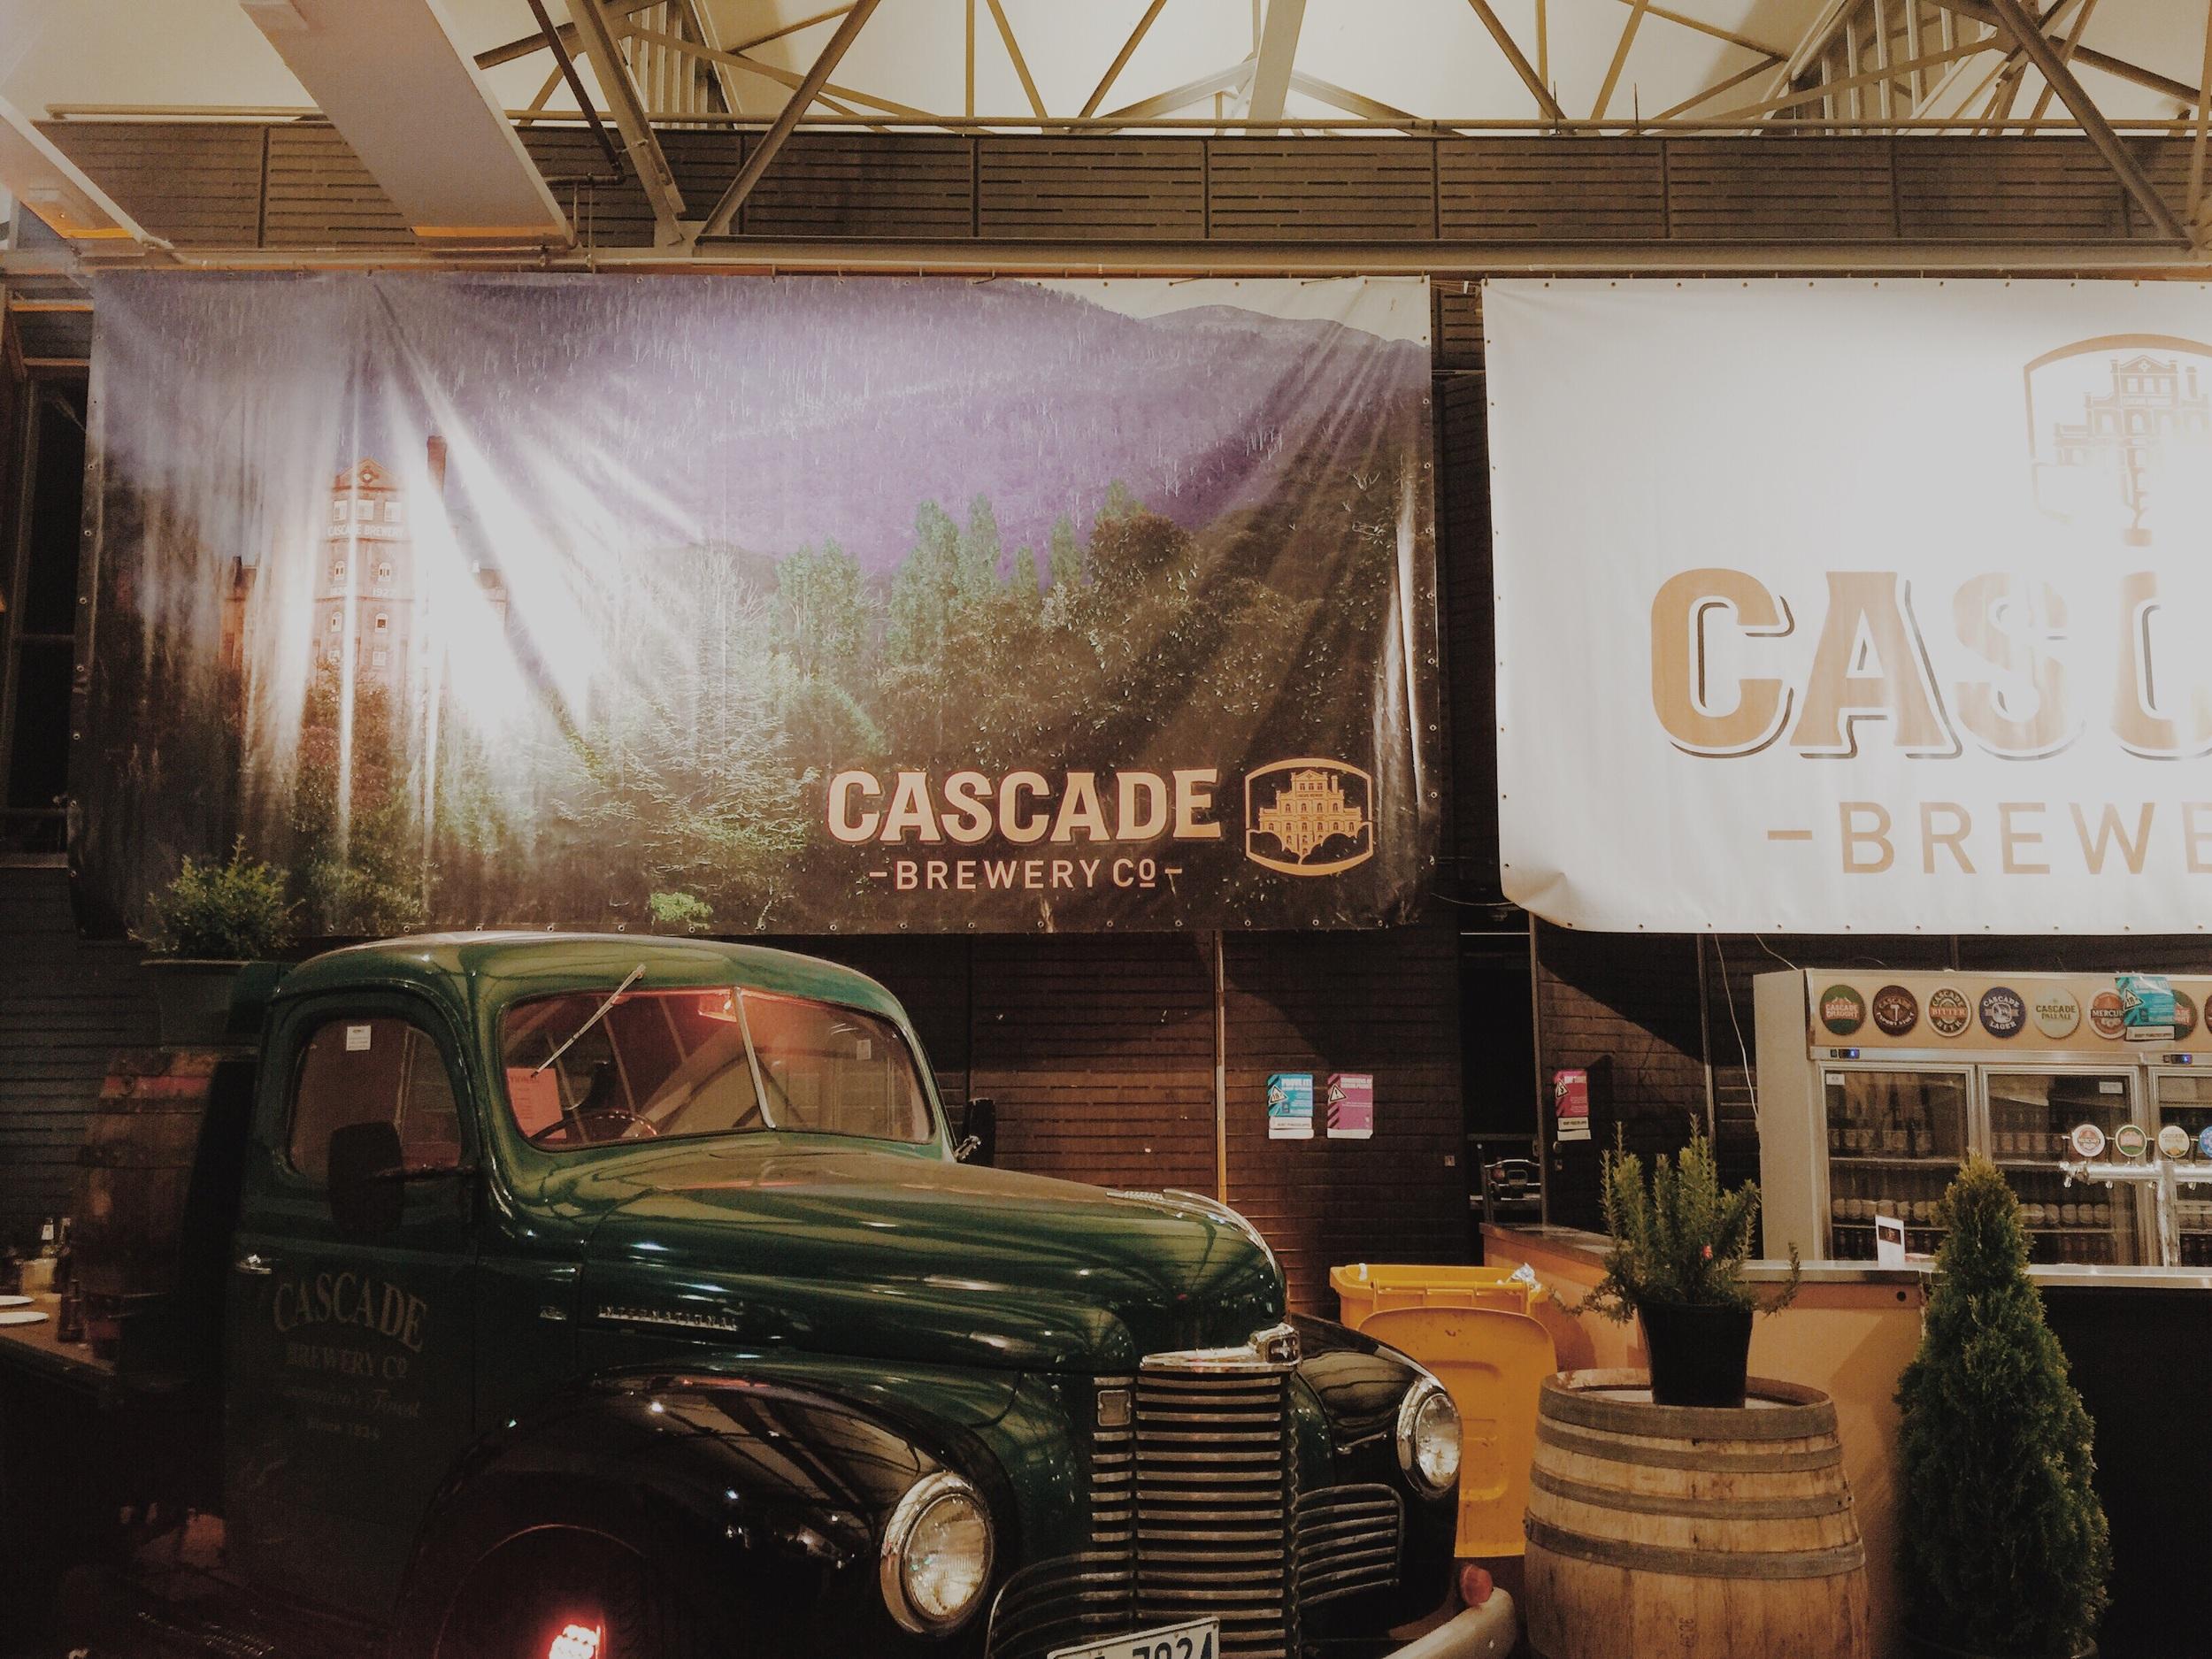 Hobart's Cascade Brewery stand